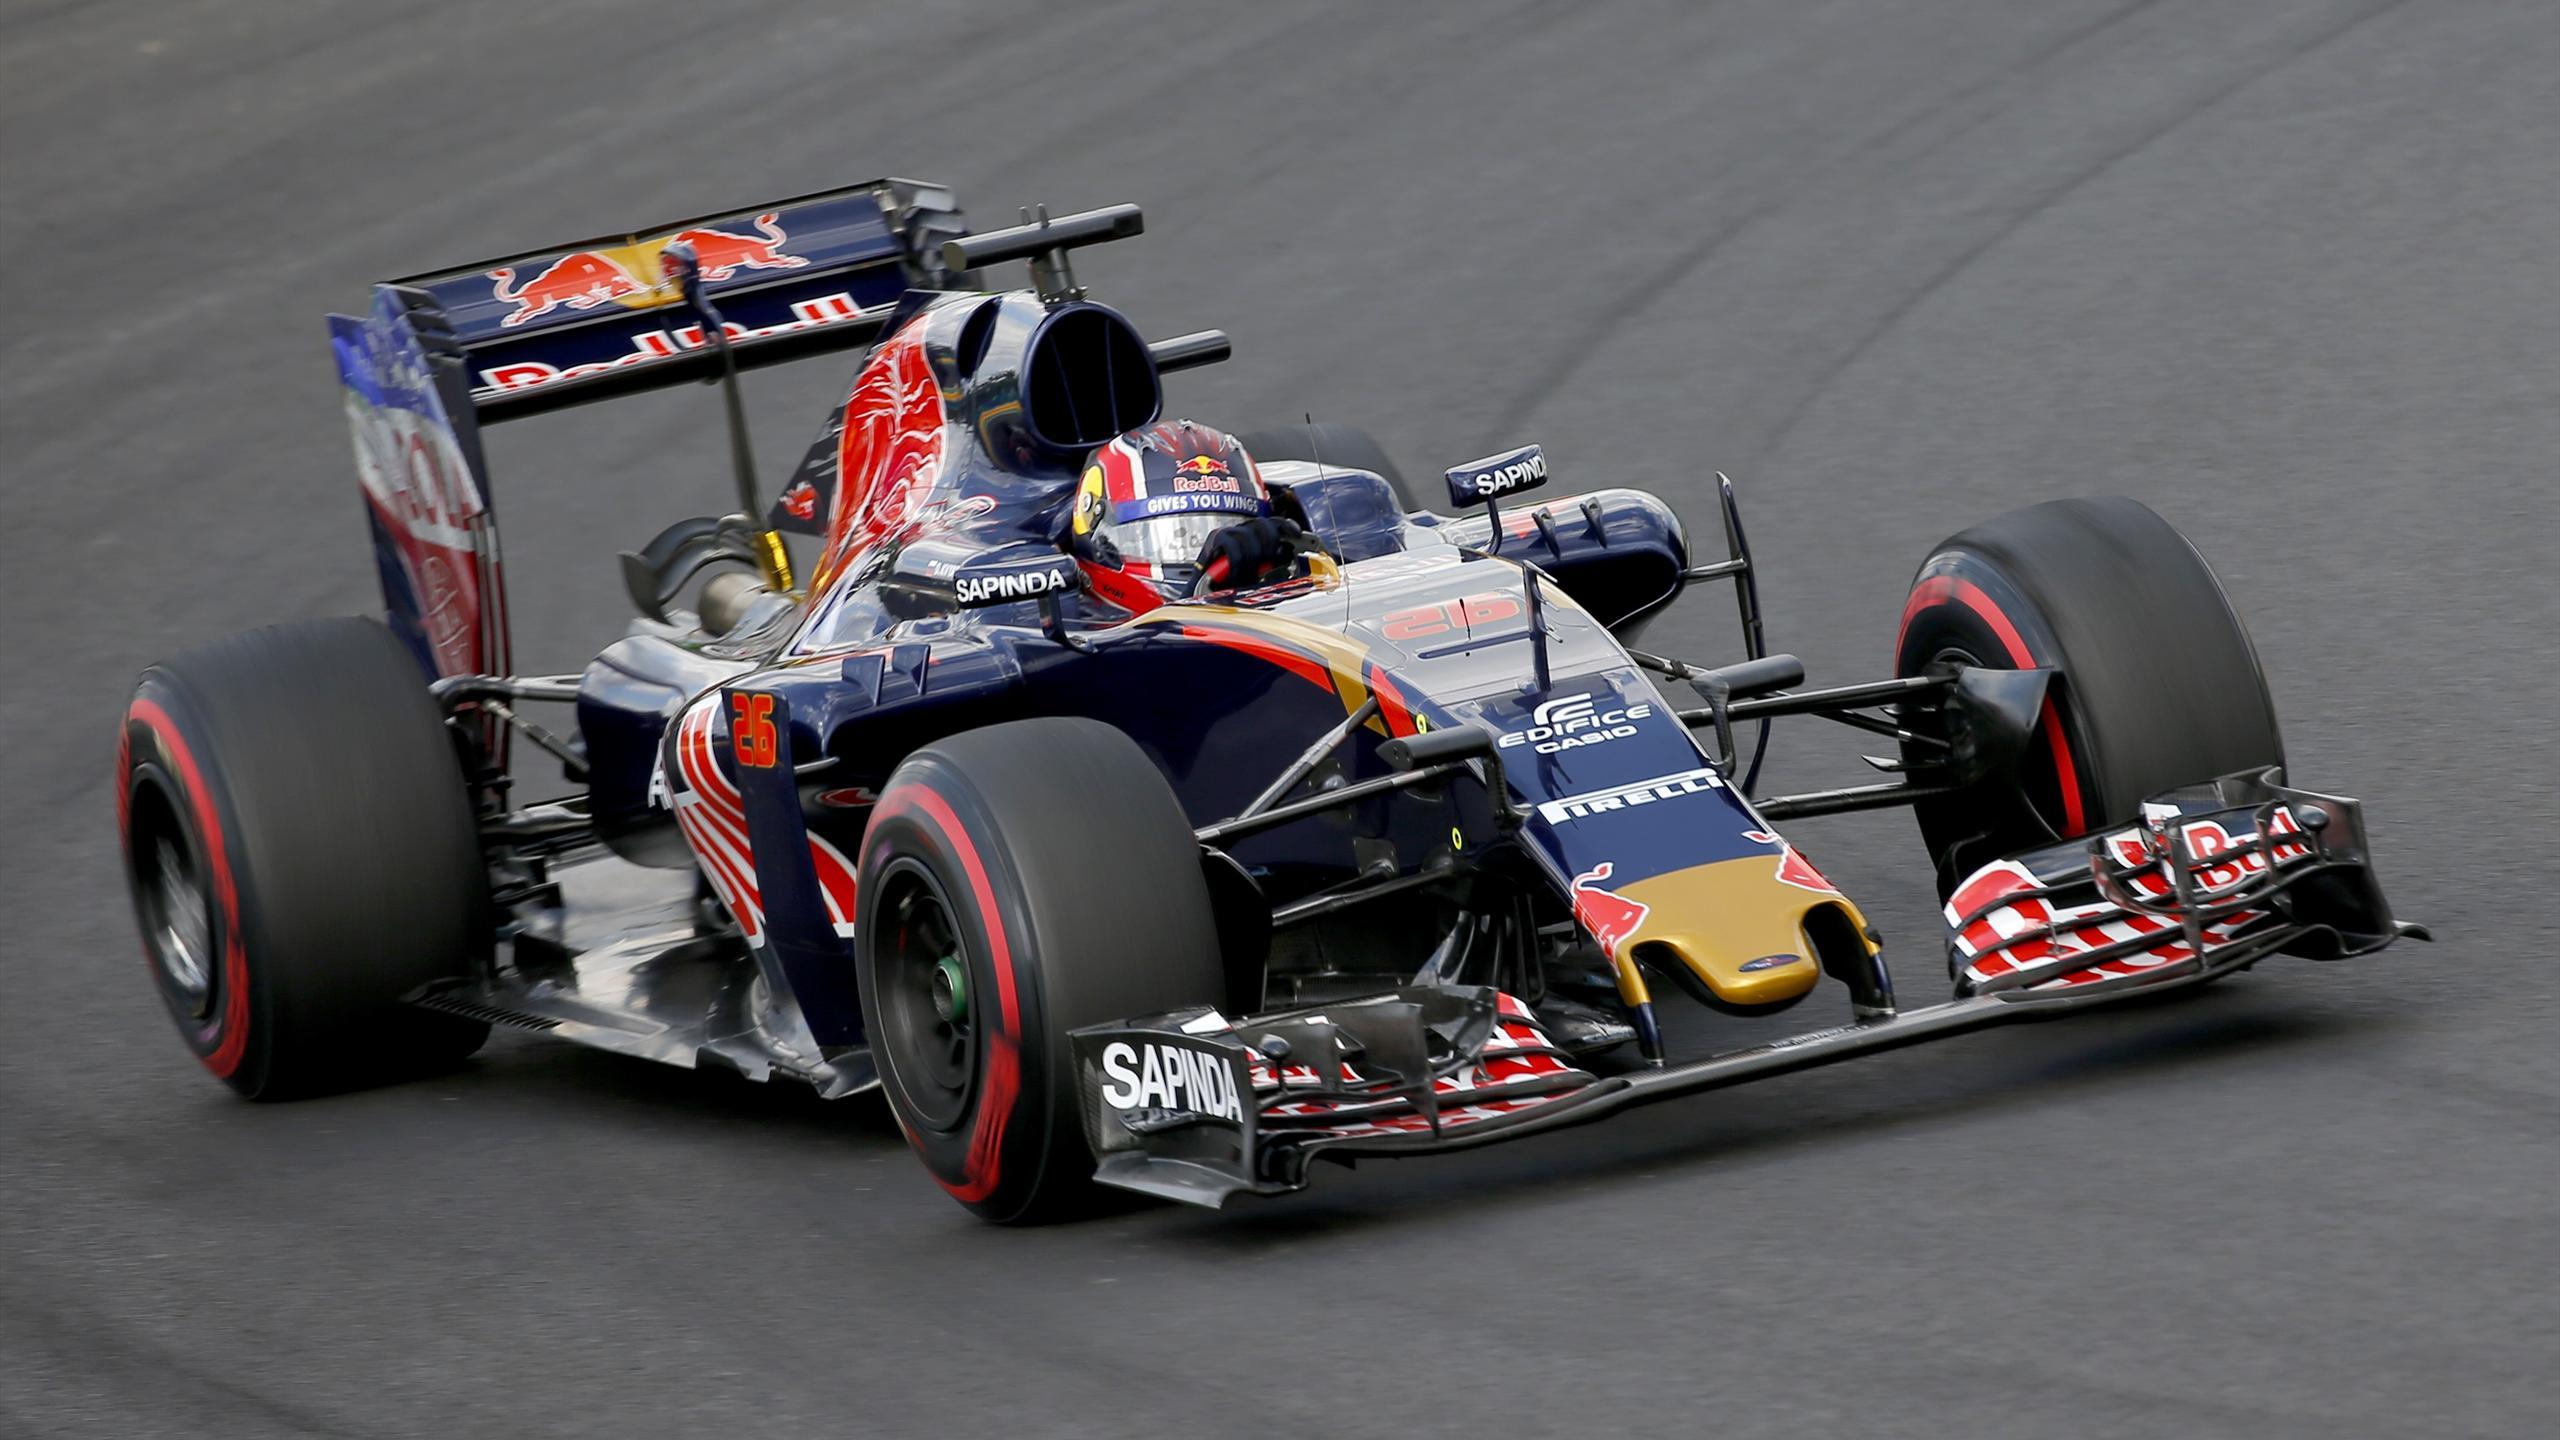 Toro Rosso's Daniil Kvyat during practice